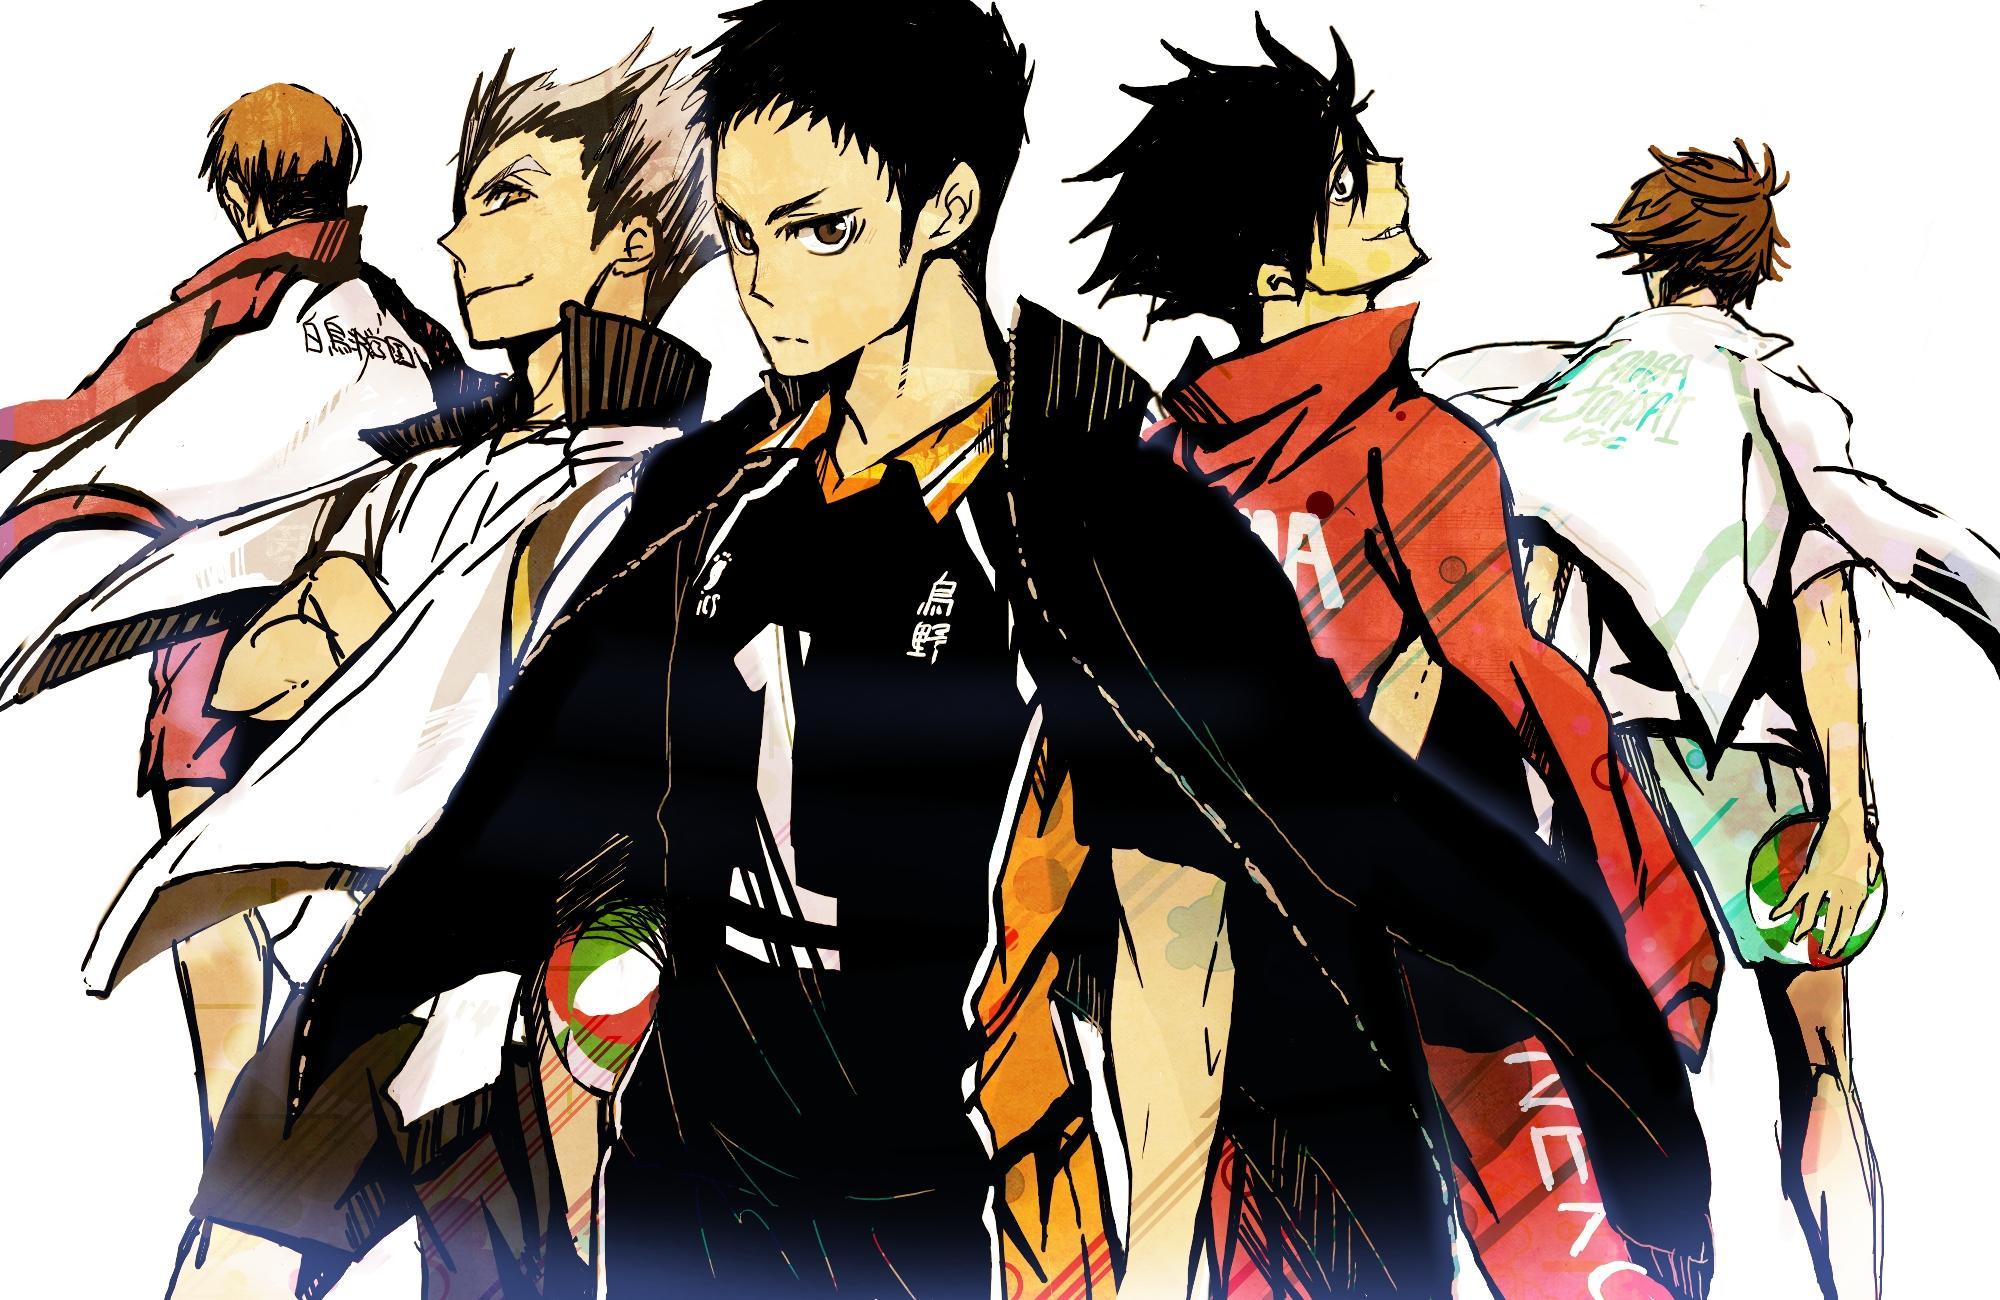 Ushijima Wakatoshi - Haikyuu!! - Zerochan Anime Image Board